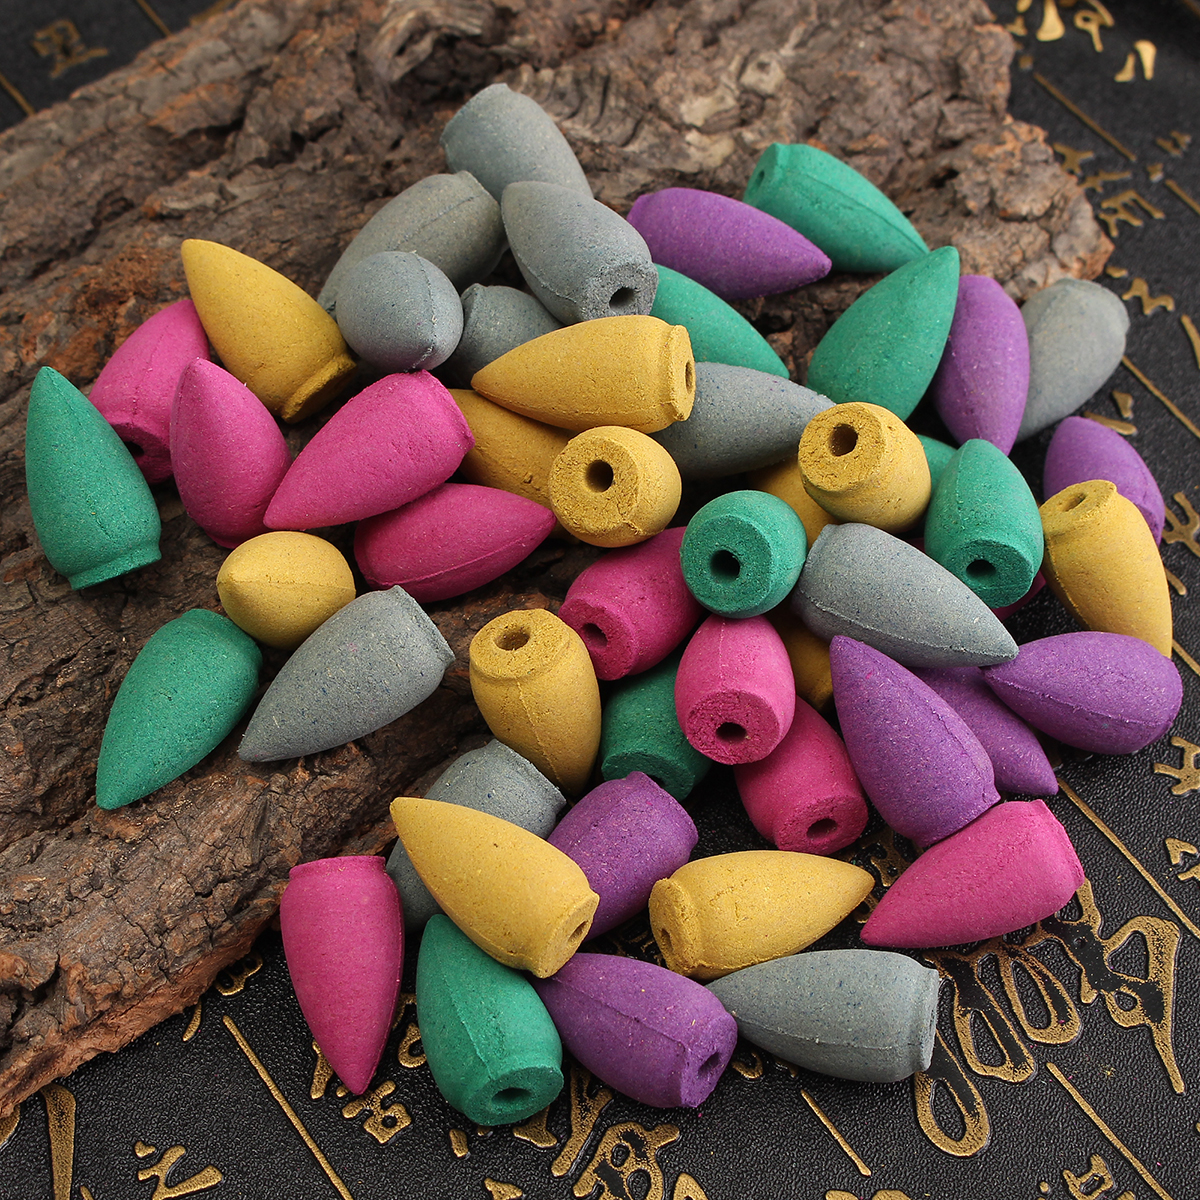 50Pcs//Bag Backflow Incense Cones Sandalwood Jasmine Lily Lavender Mixed Fragranc